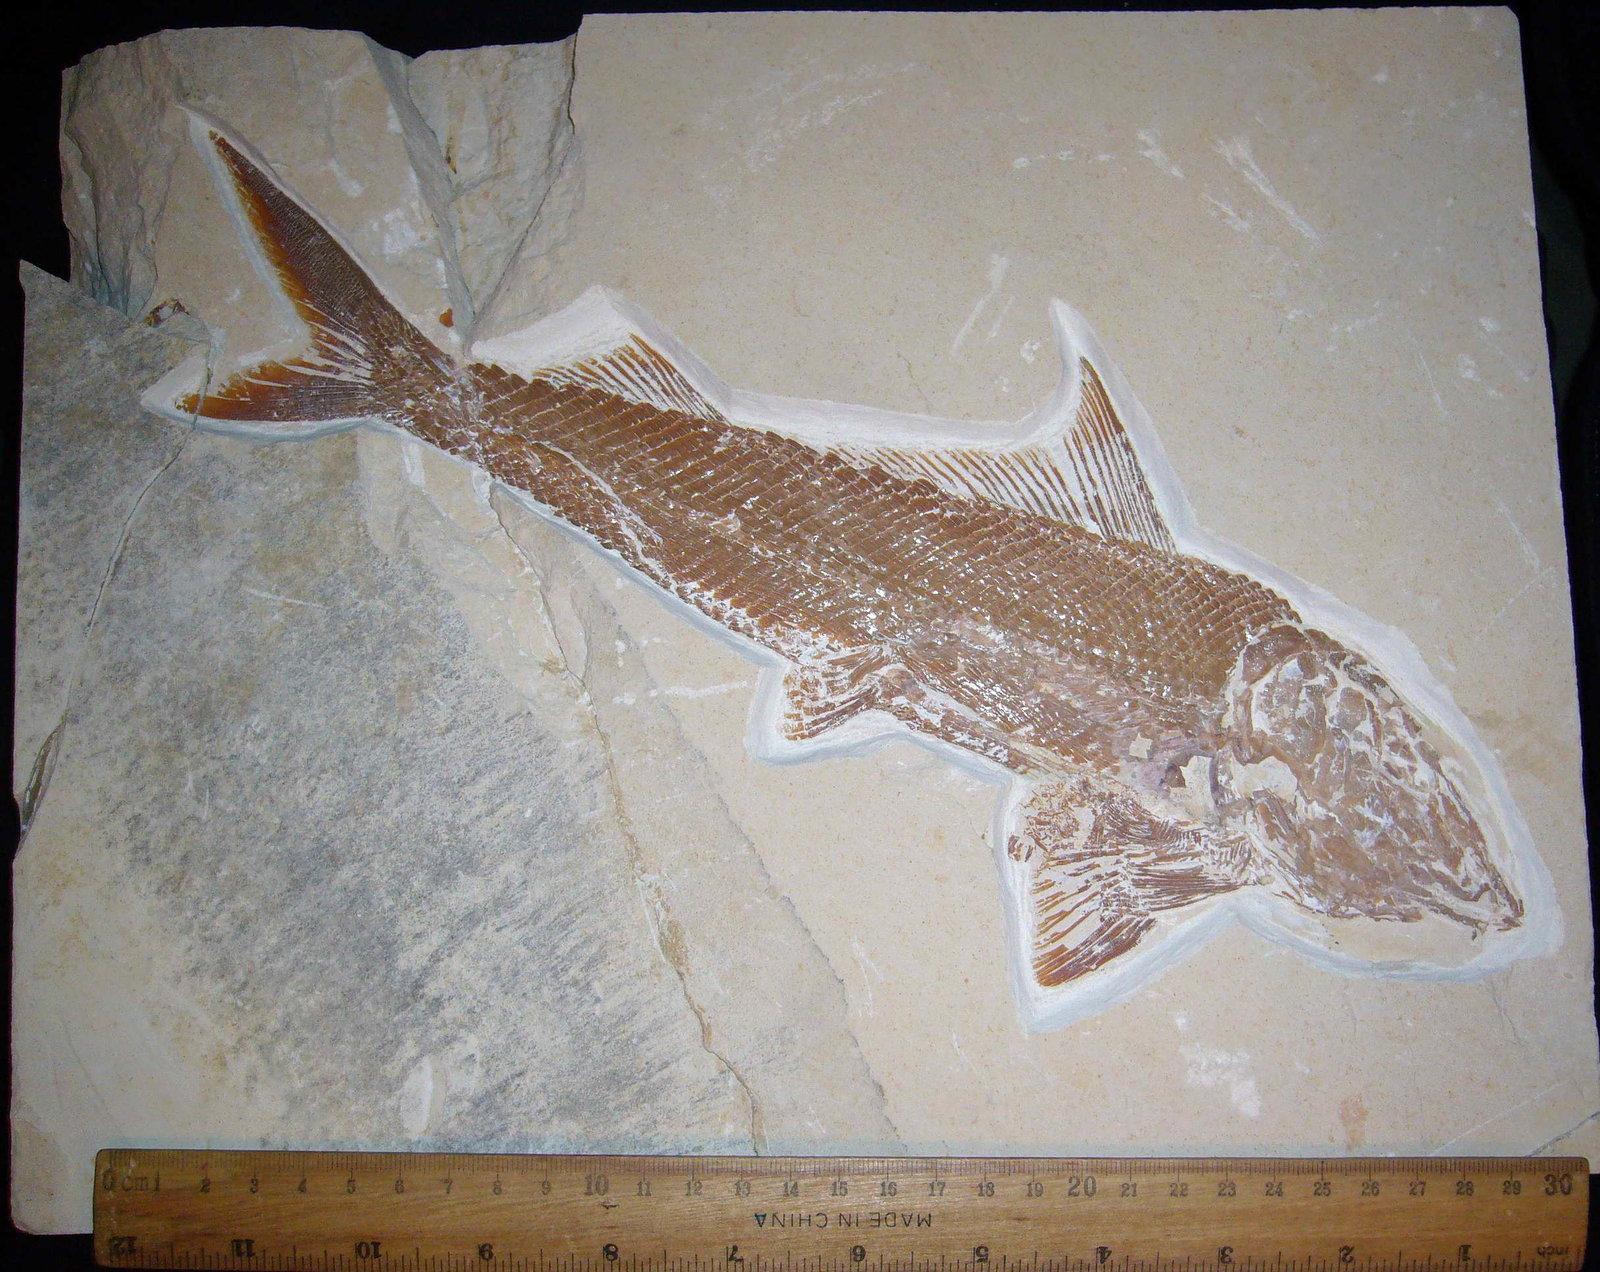 RNC 0301 (a) (Petalopteryx Syriacus).jpg